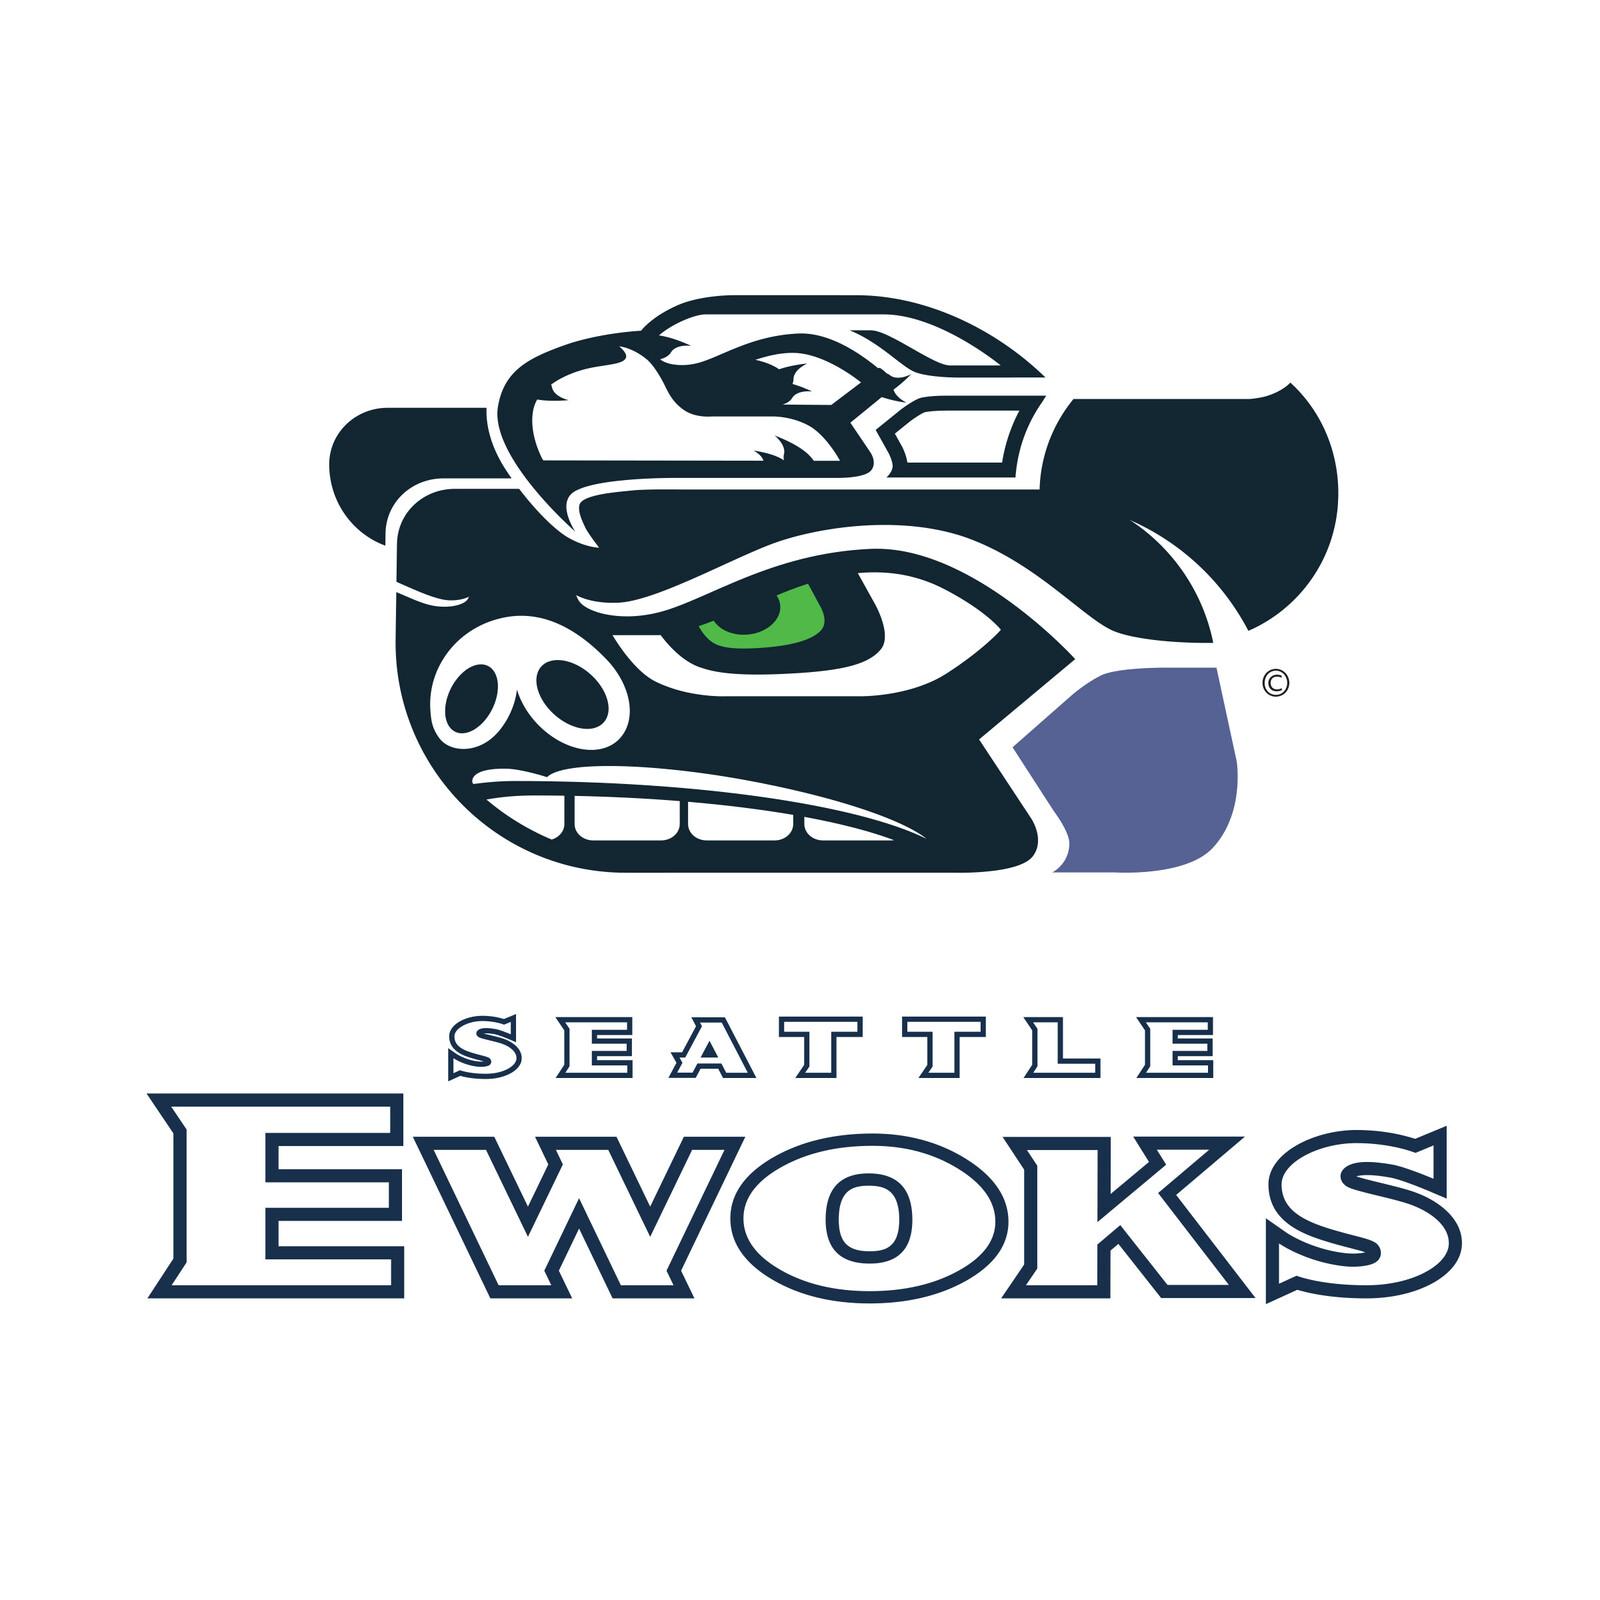 Seattle Ewoks